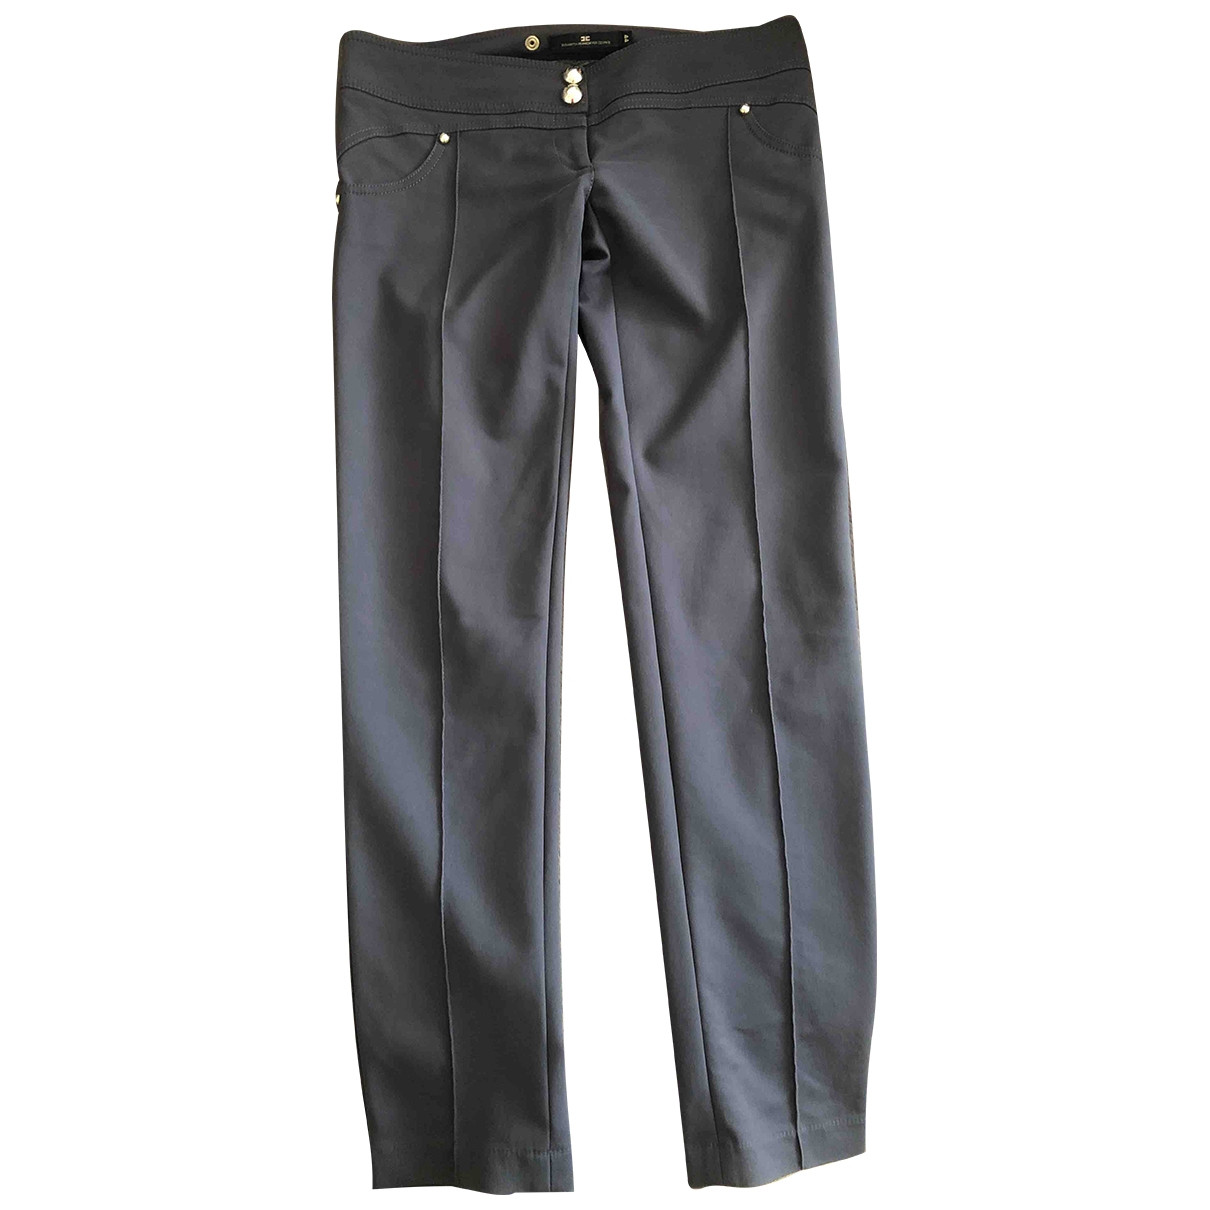 Elisabetta Franchi \N Grey Spandex Trousers for Women 44 IT